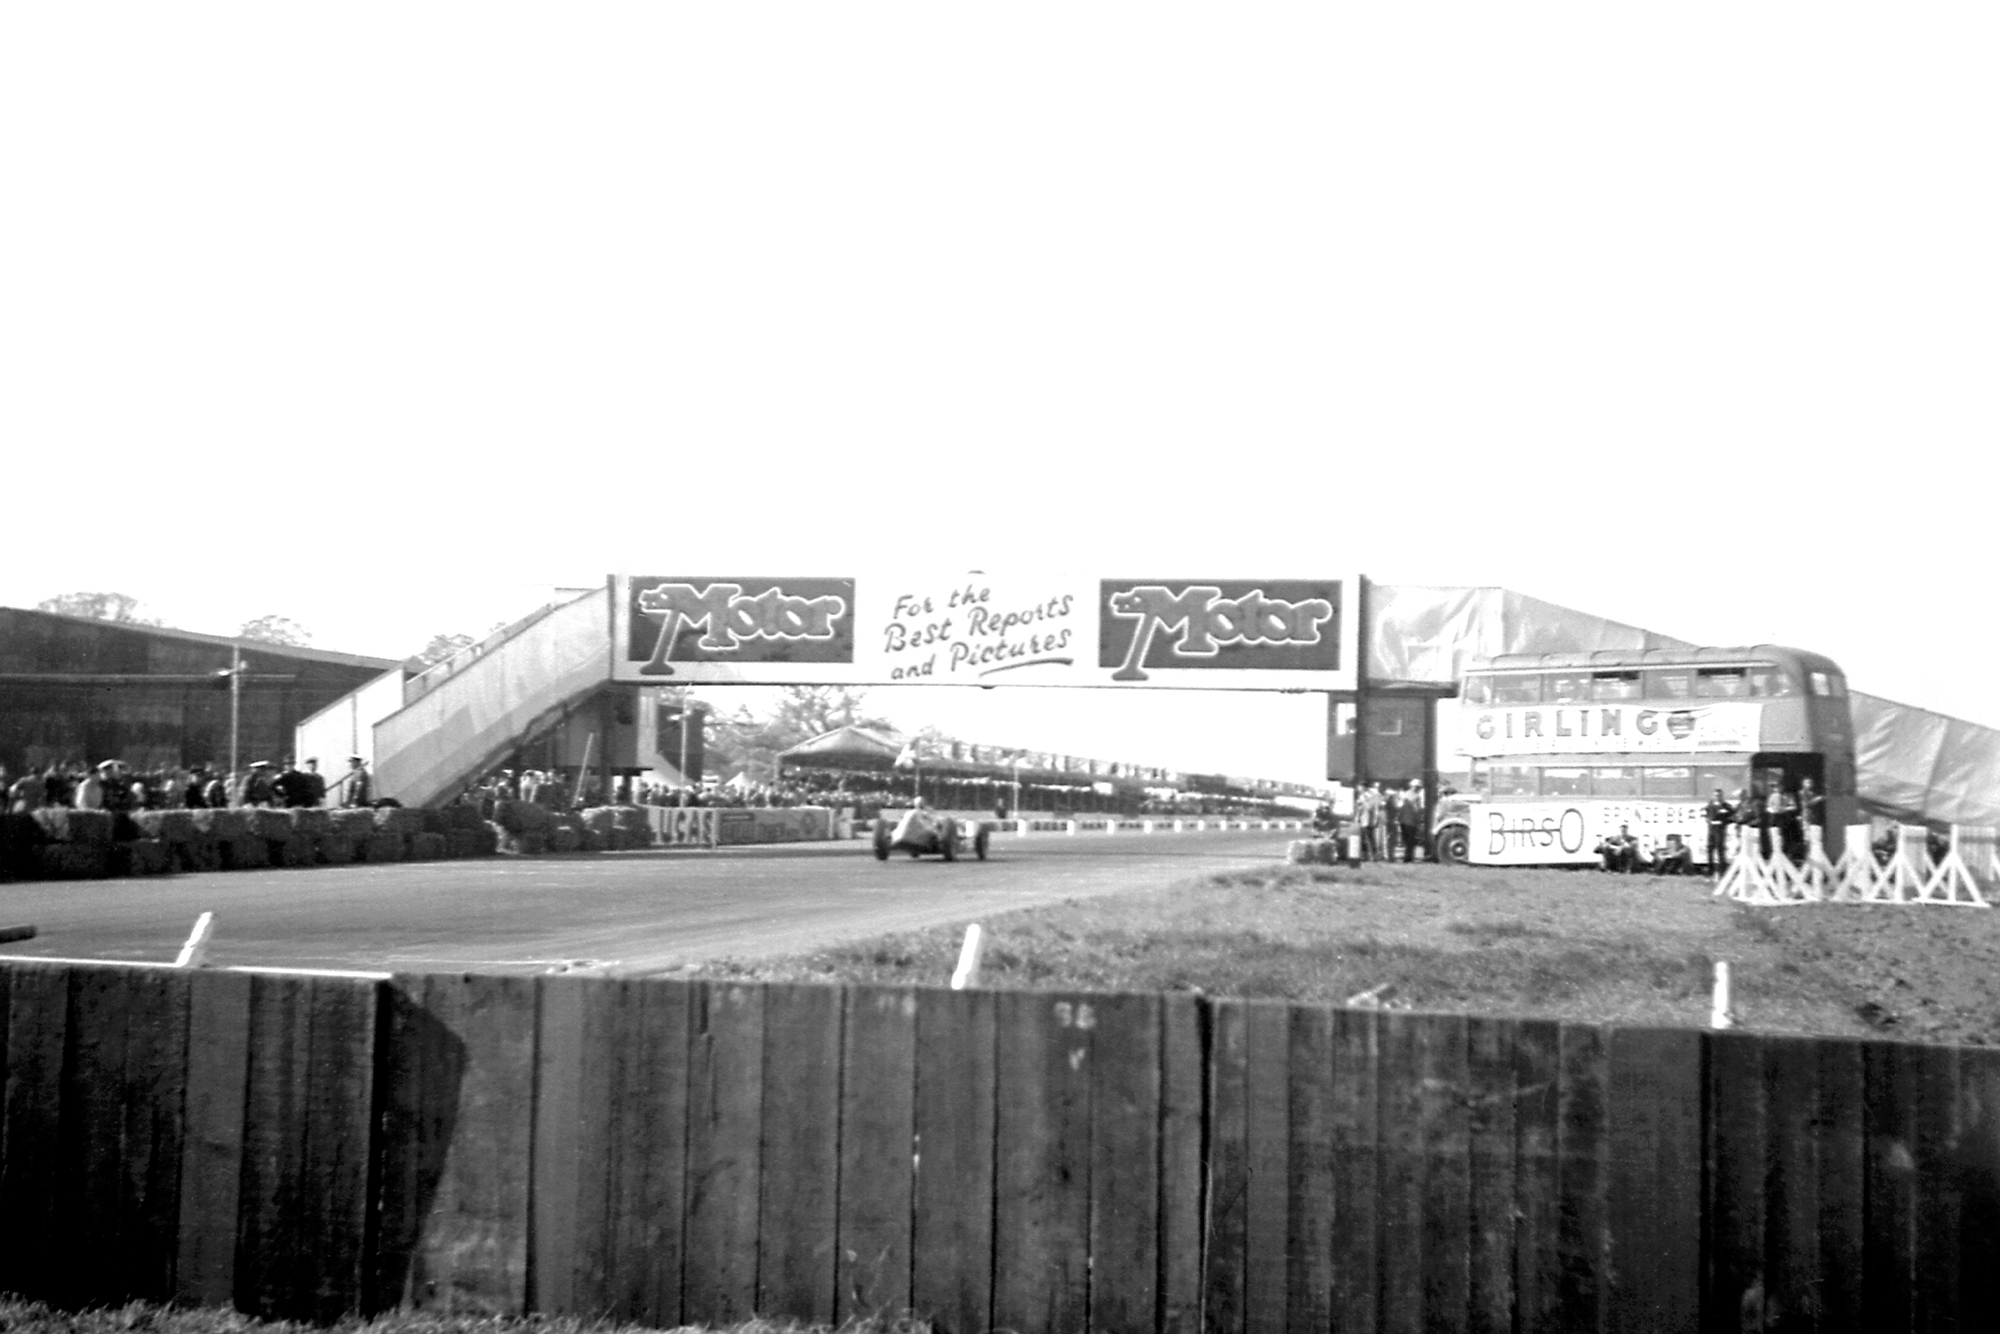 Startline bridge at the 1950 British Grand Prix